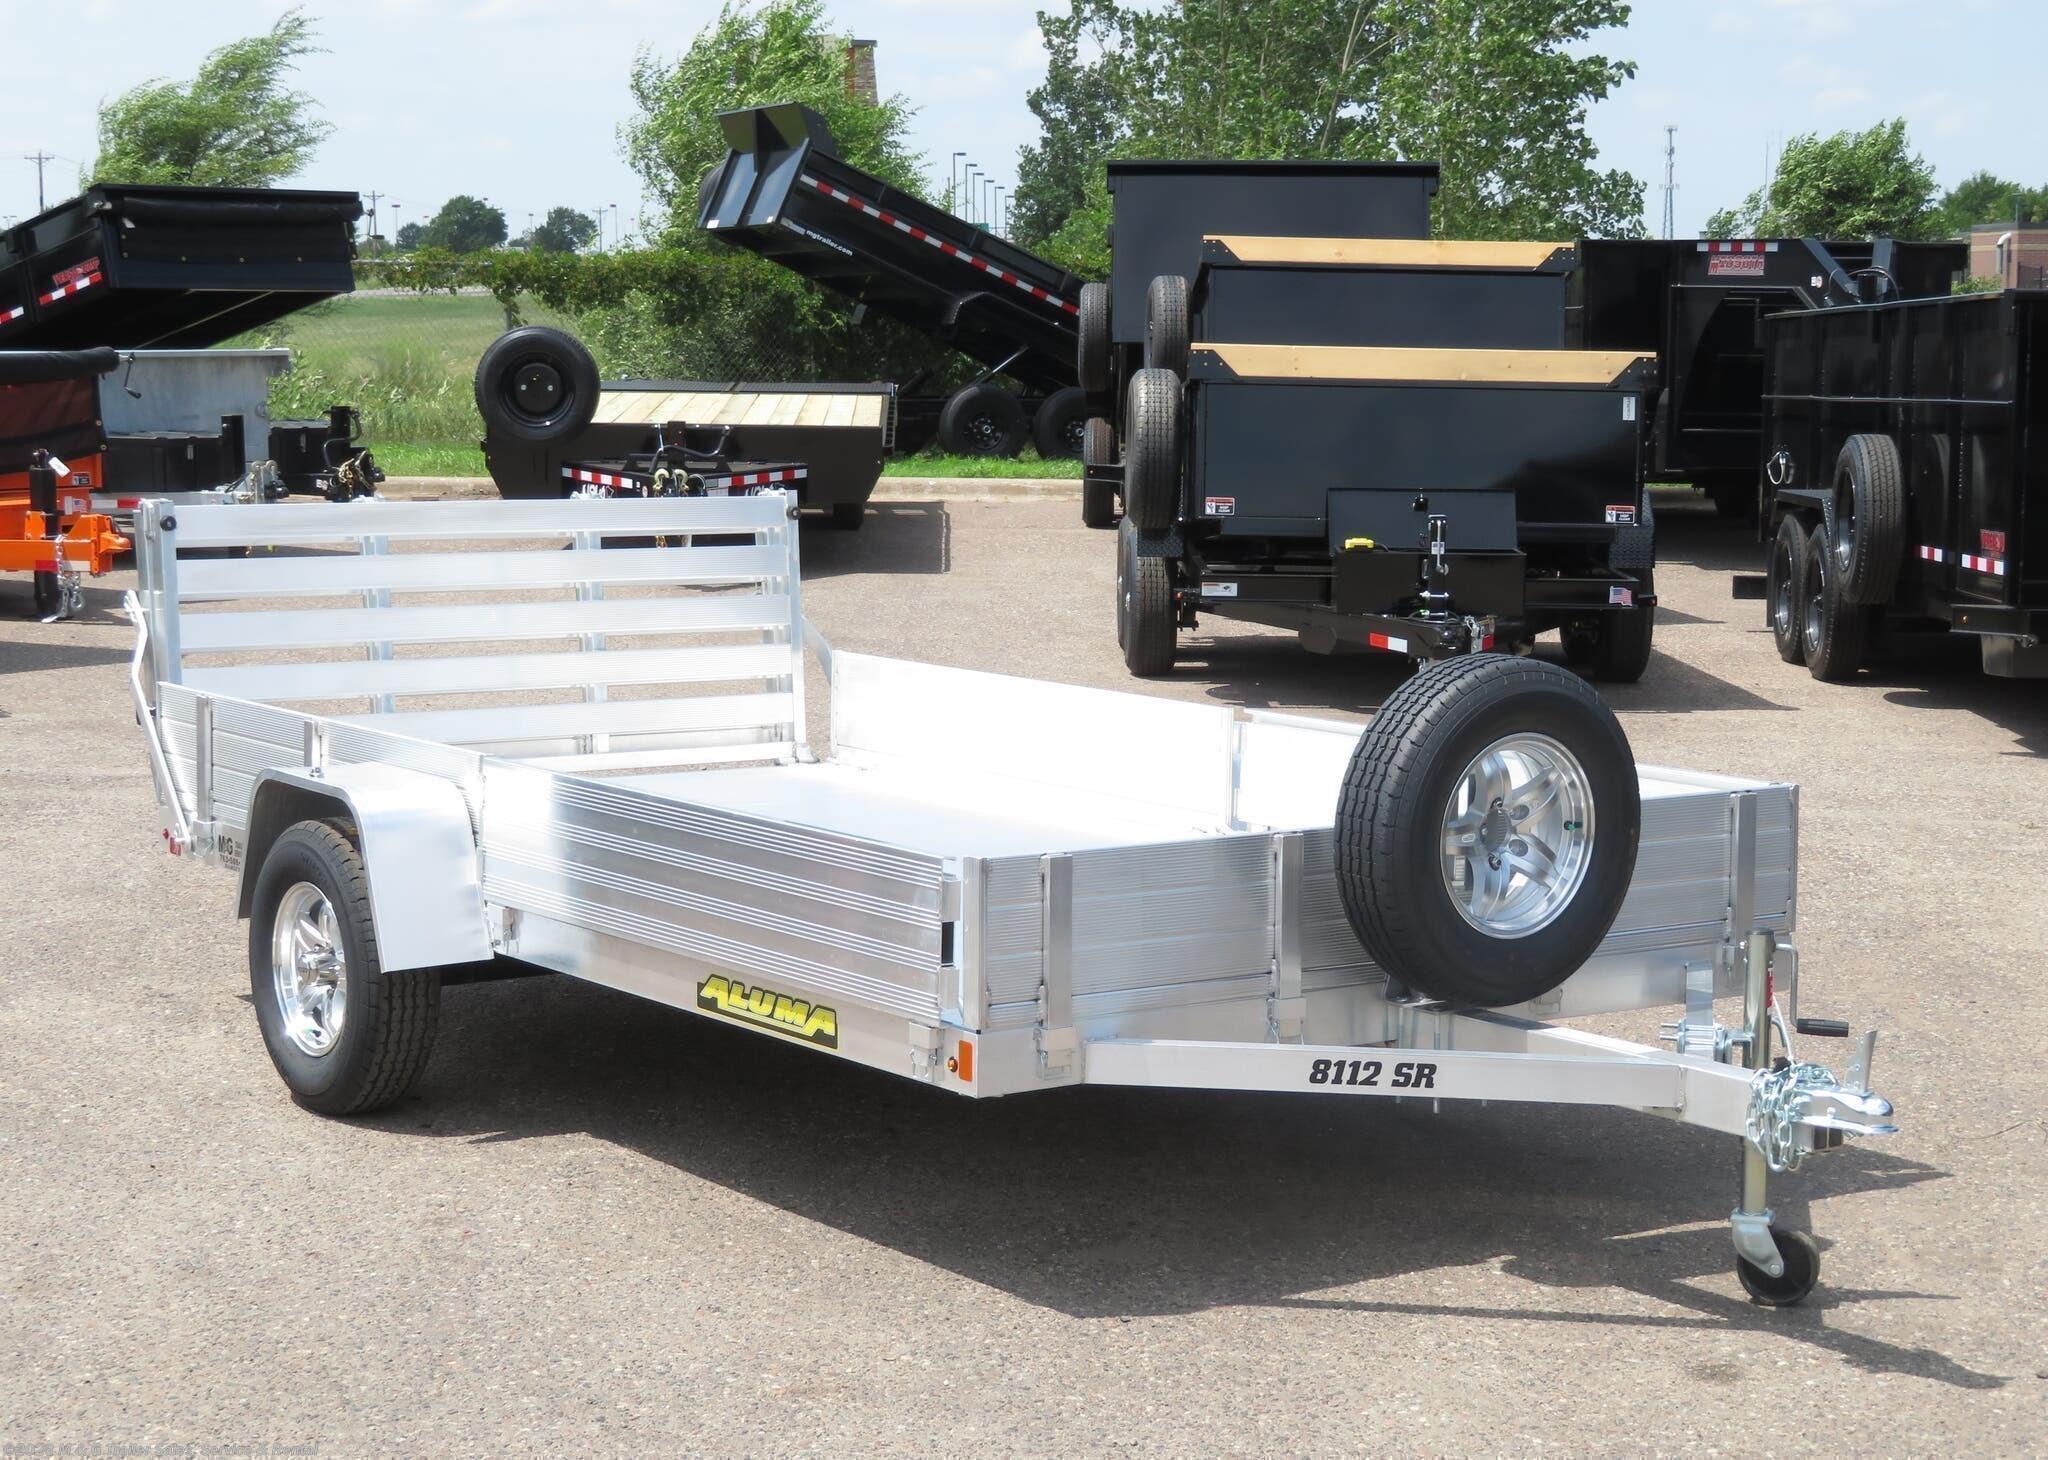 2021 Aluma 8112 SR Aluminum ATV/Utility Trailer - Stock #227169